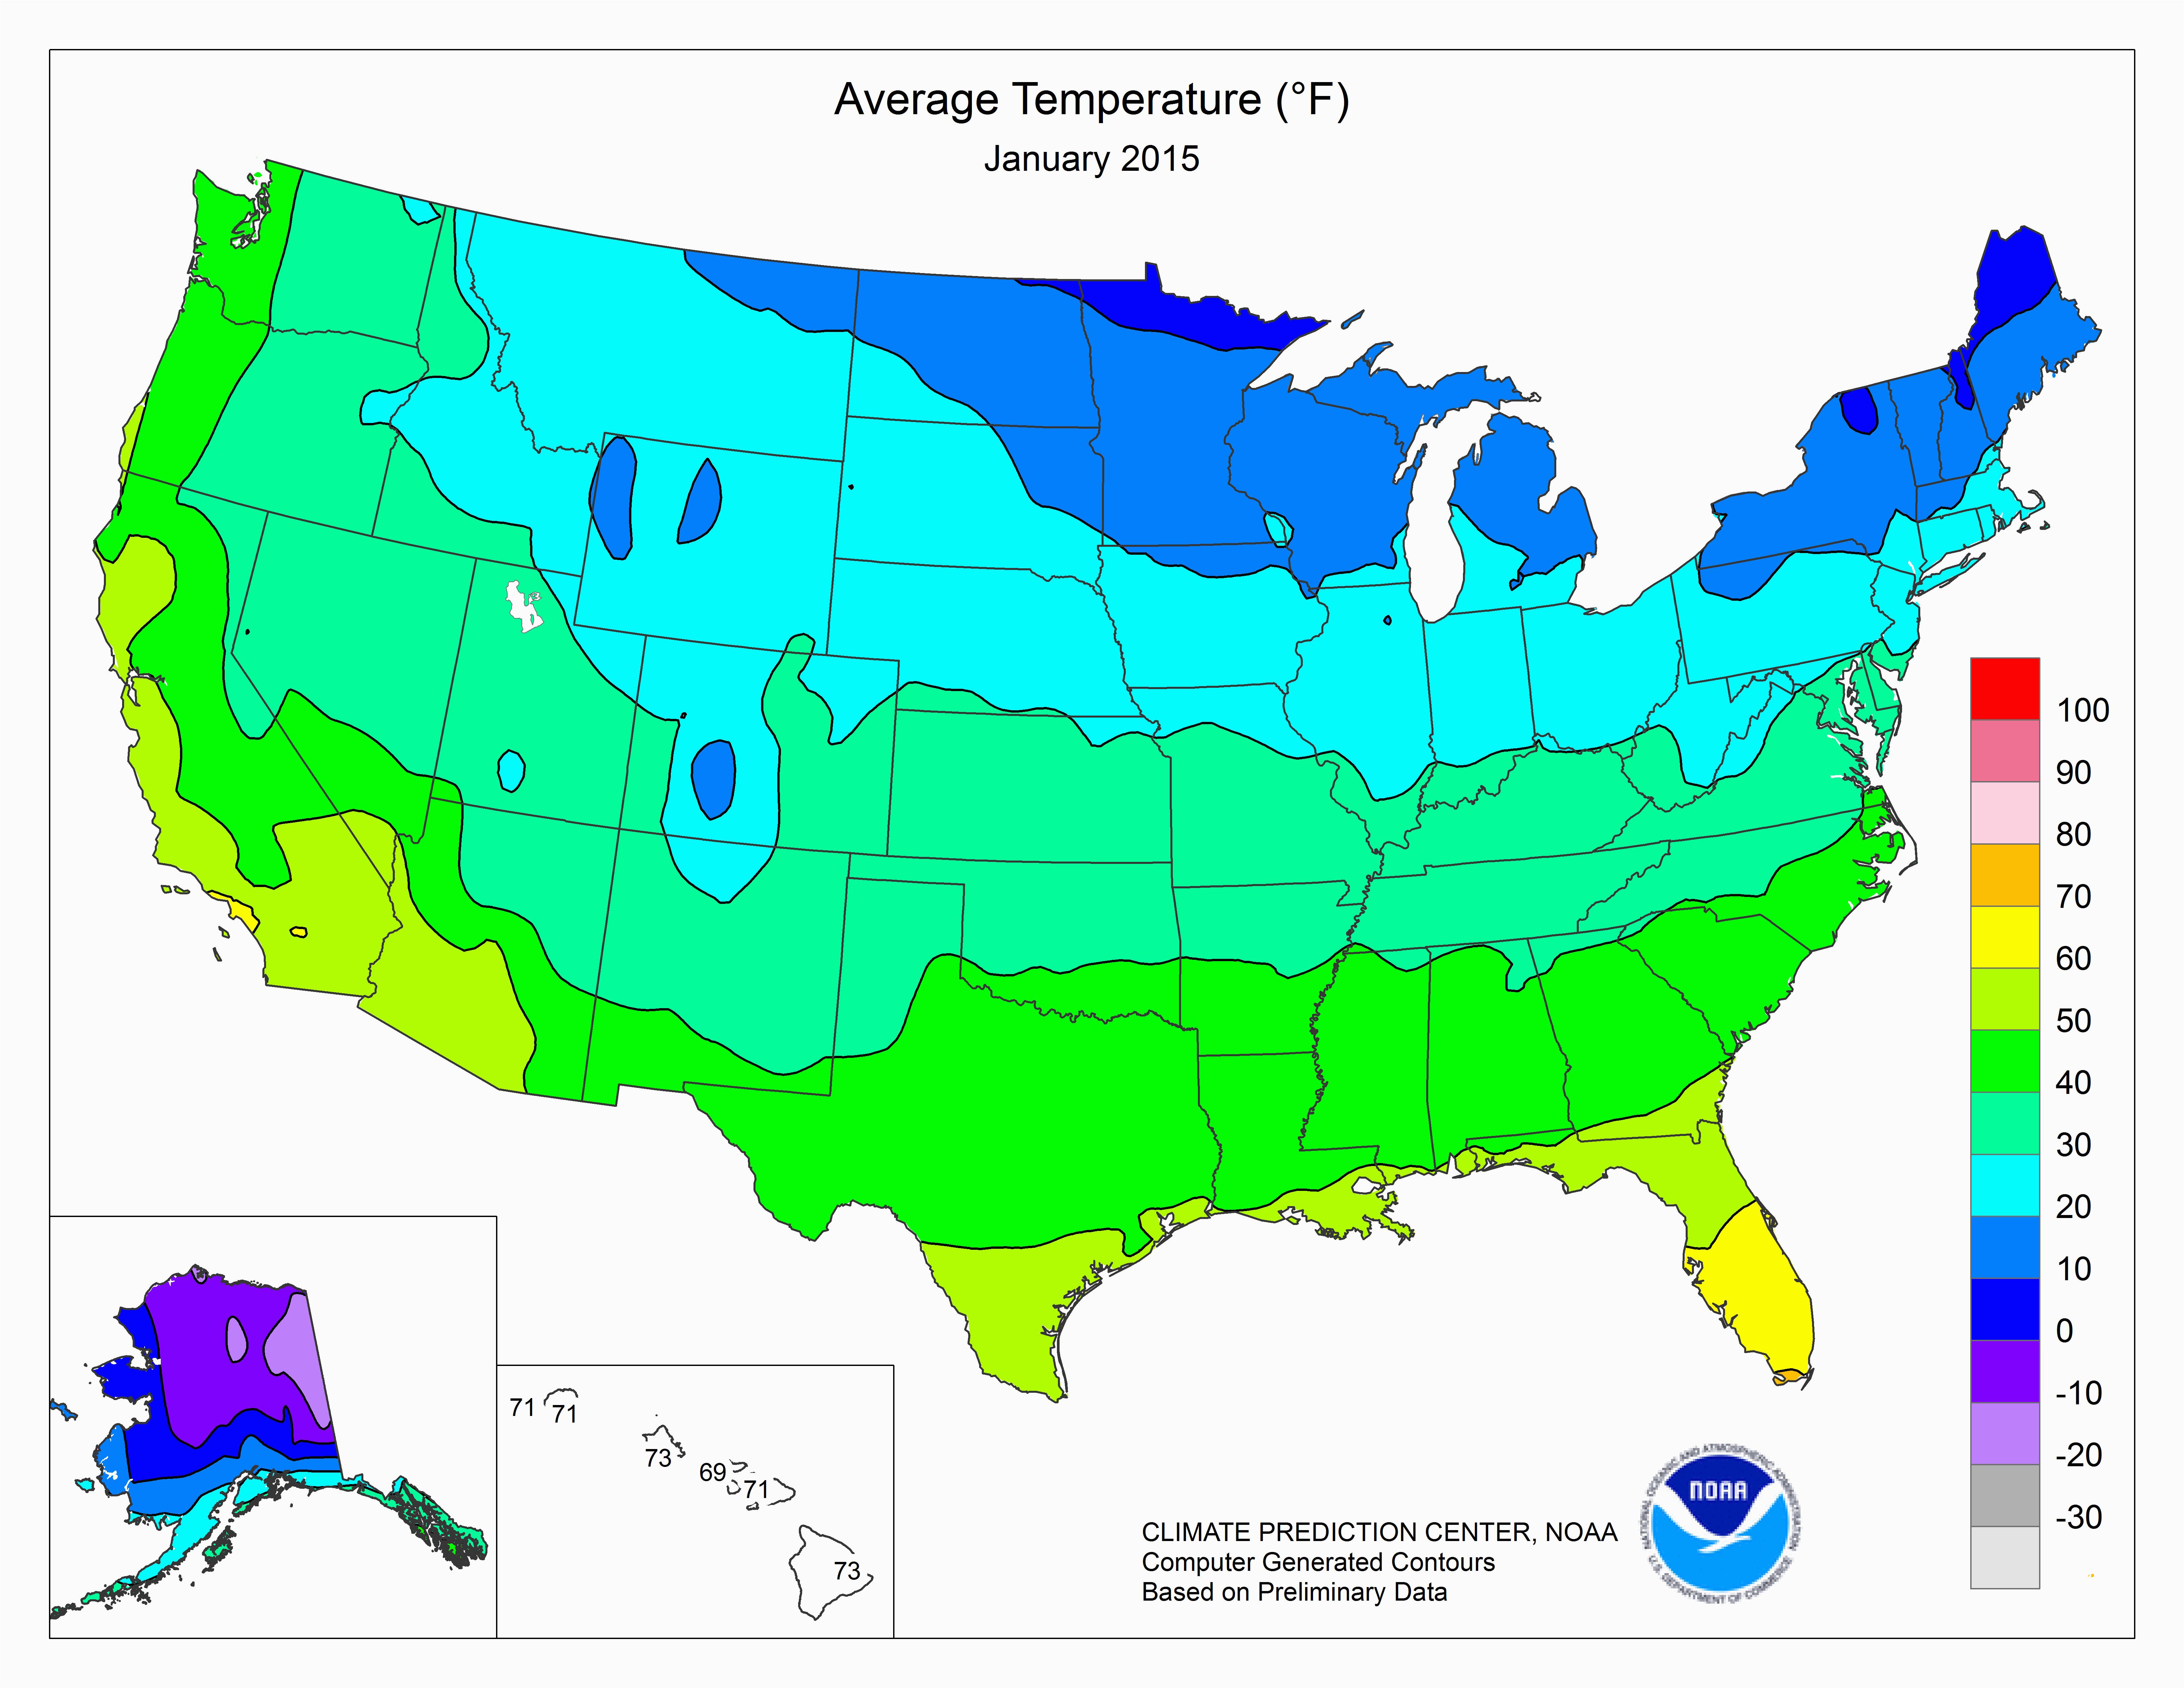 California Average Temperature Map Climate Prediction Center Monitoring and Data United States One